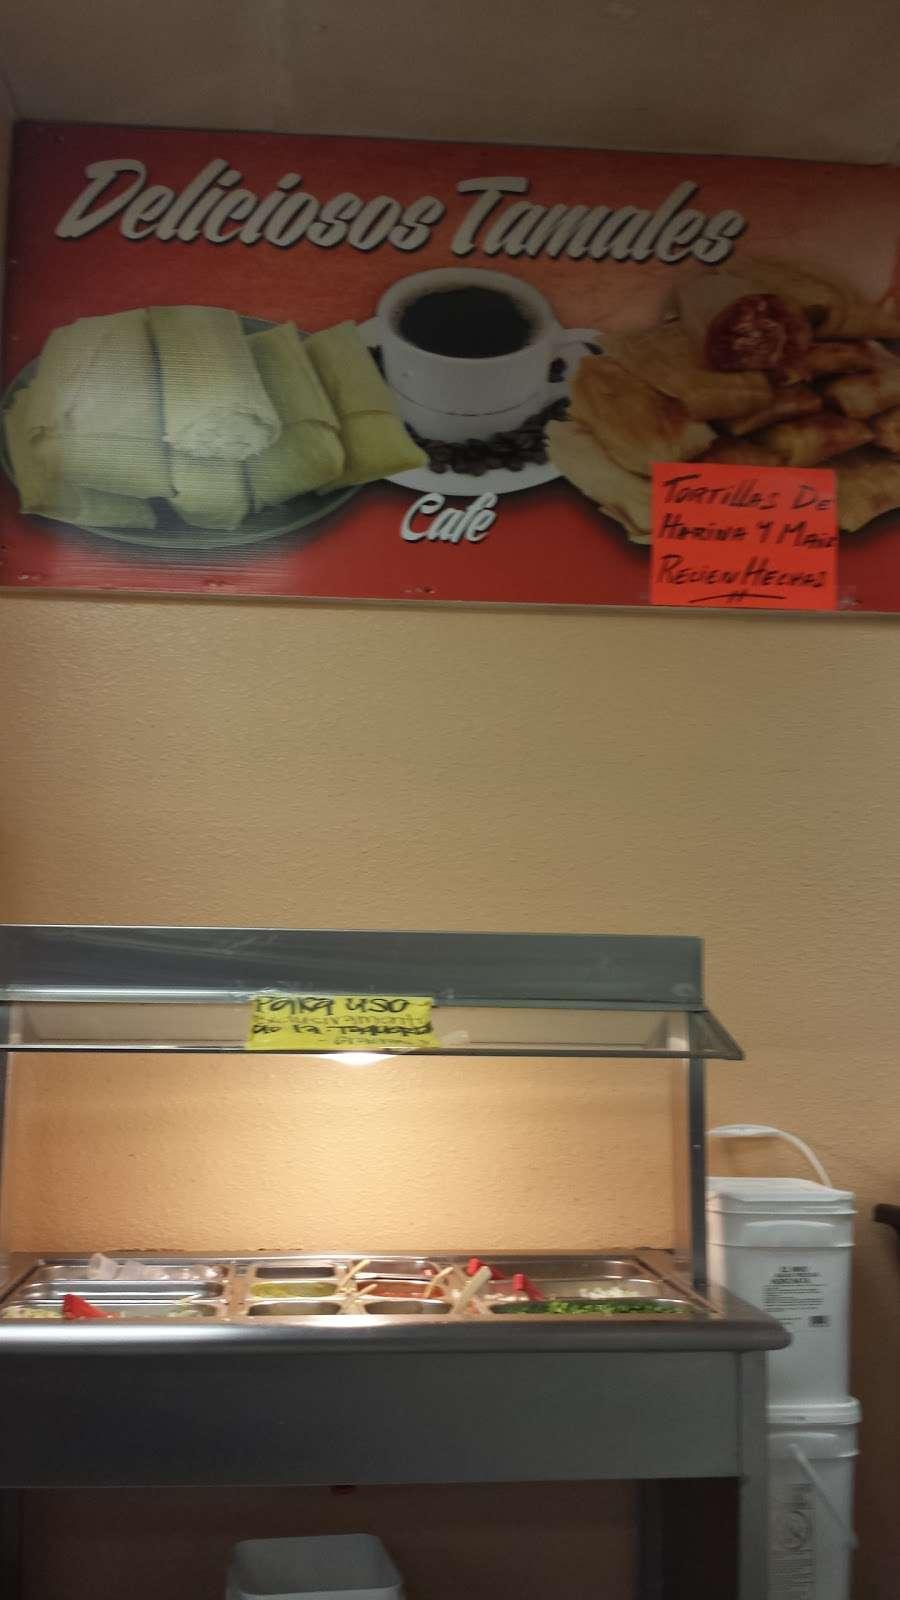 Regios Meat Market - store  | Photo 3 of 4 | Address: 13218 Hwy 6, Rosharon, TX 77583, USA | Phone: (281) 431-1380